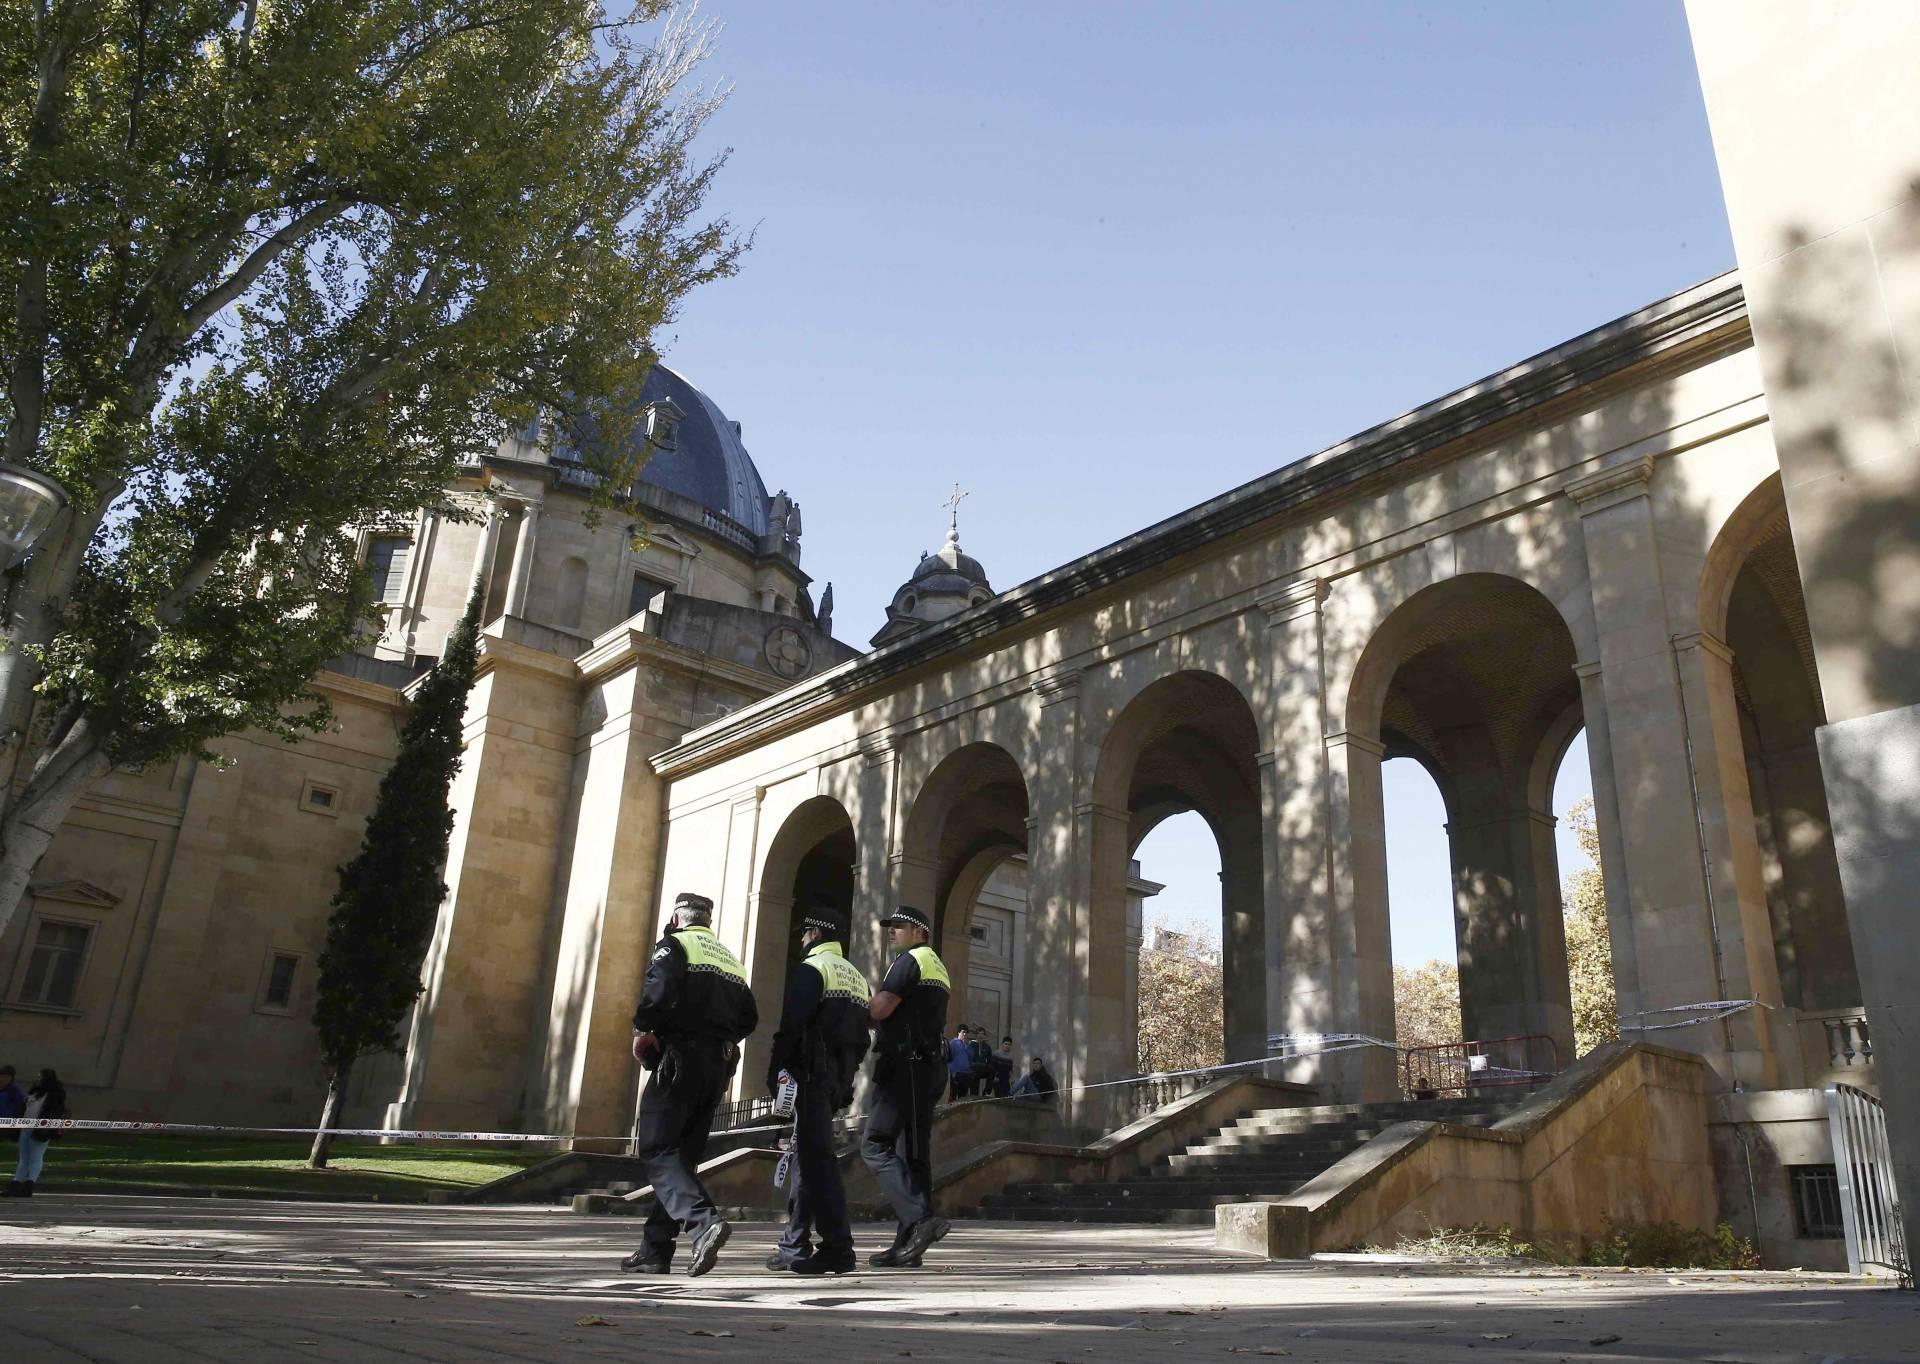 Monumento a los caidos de Pamplona.